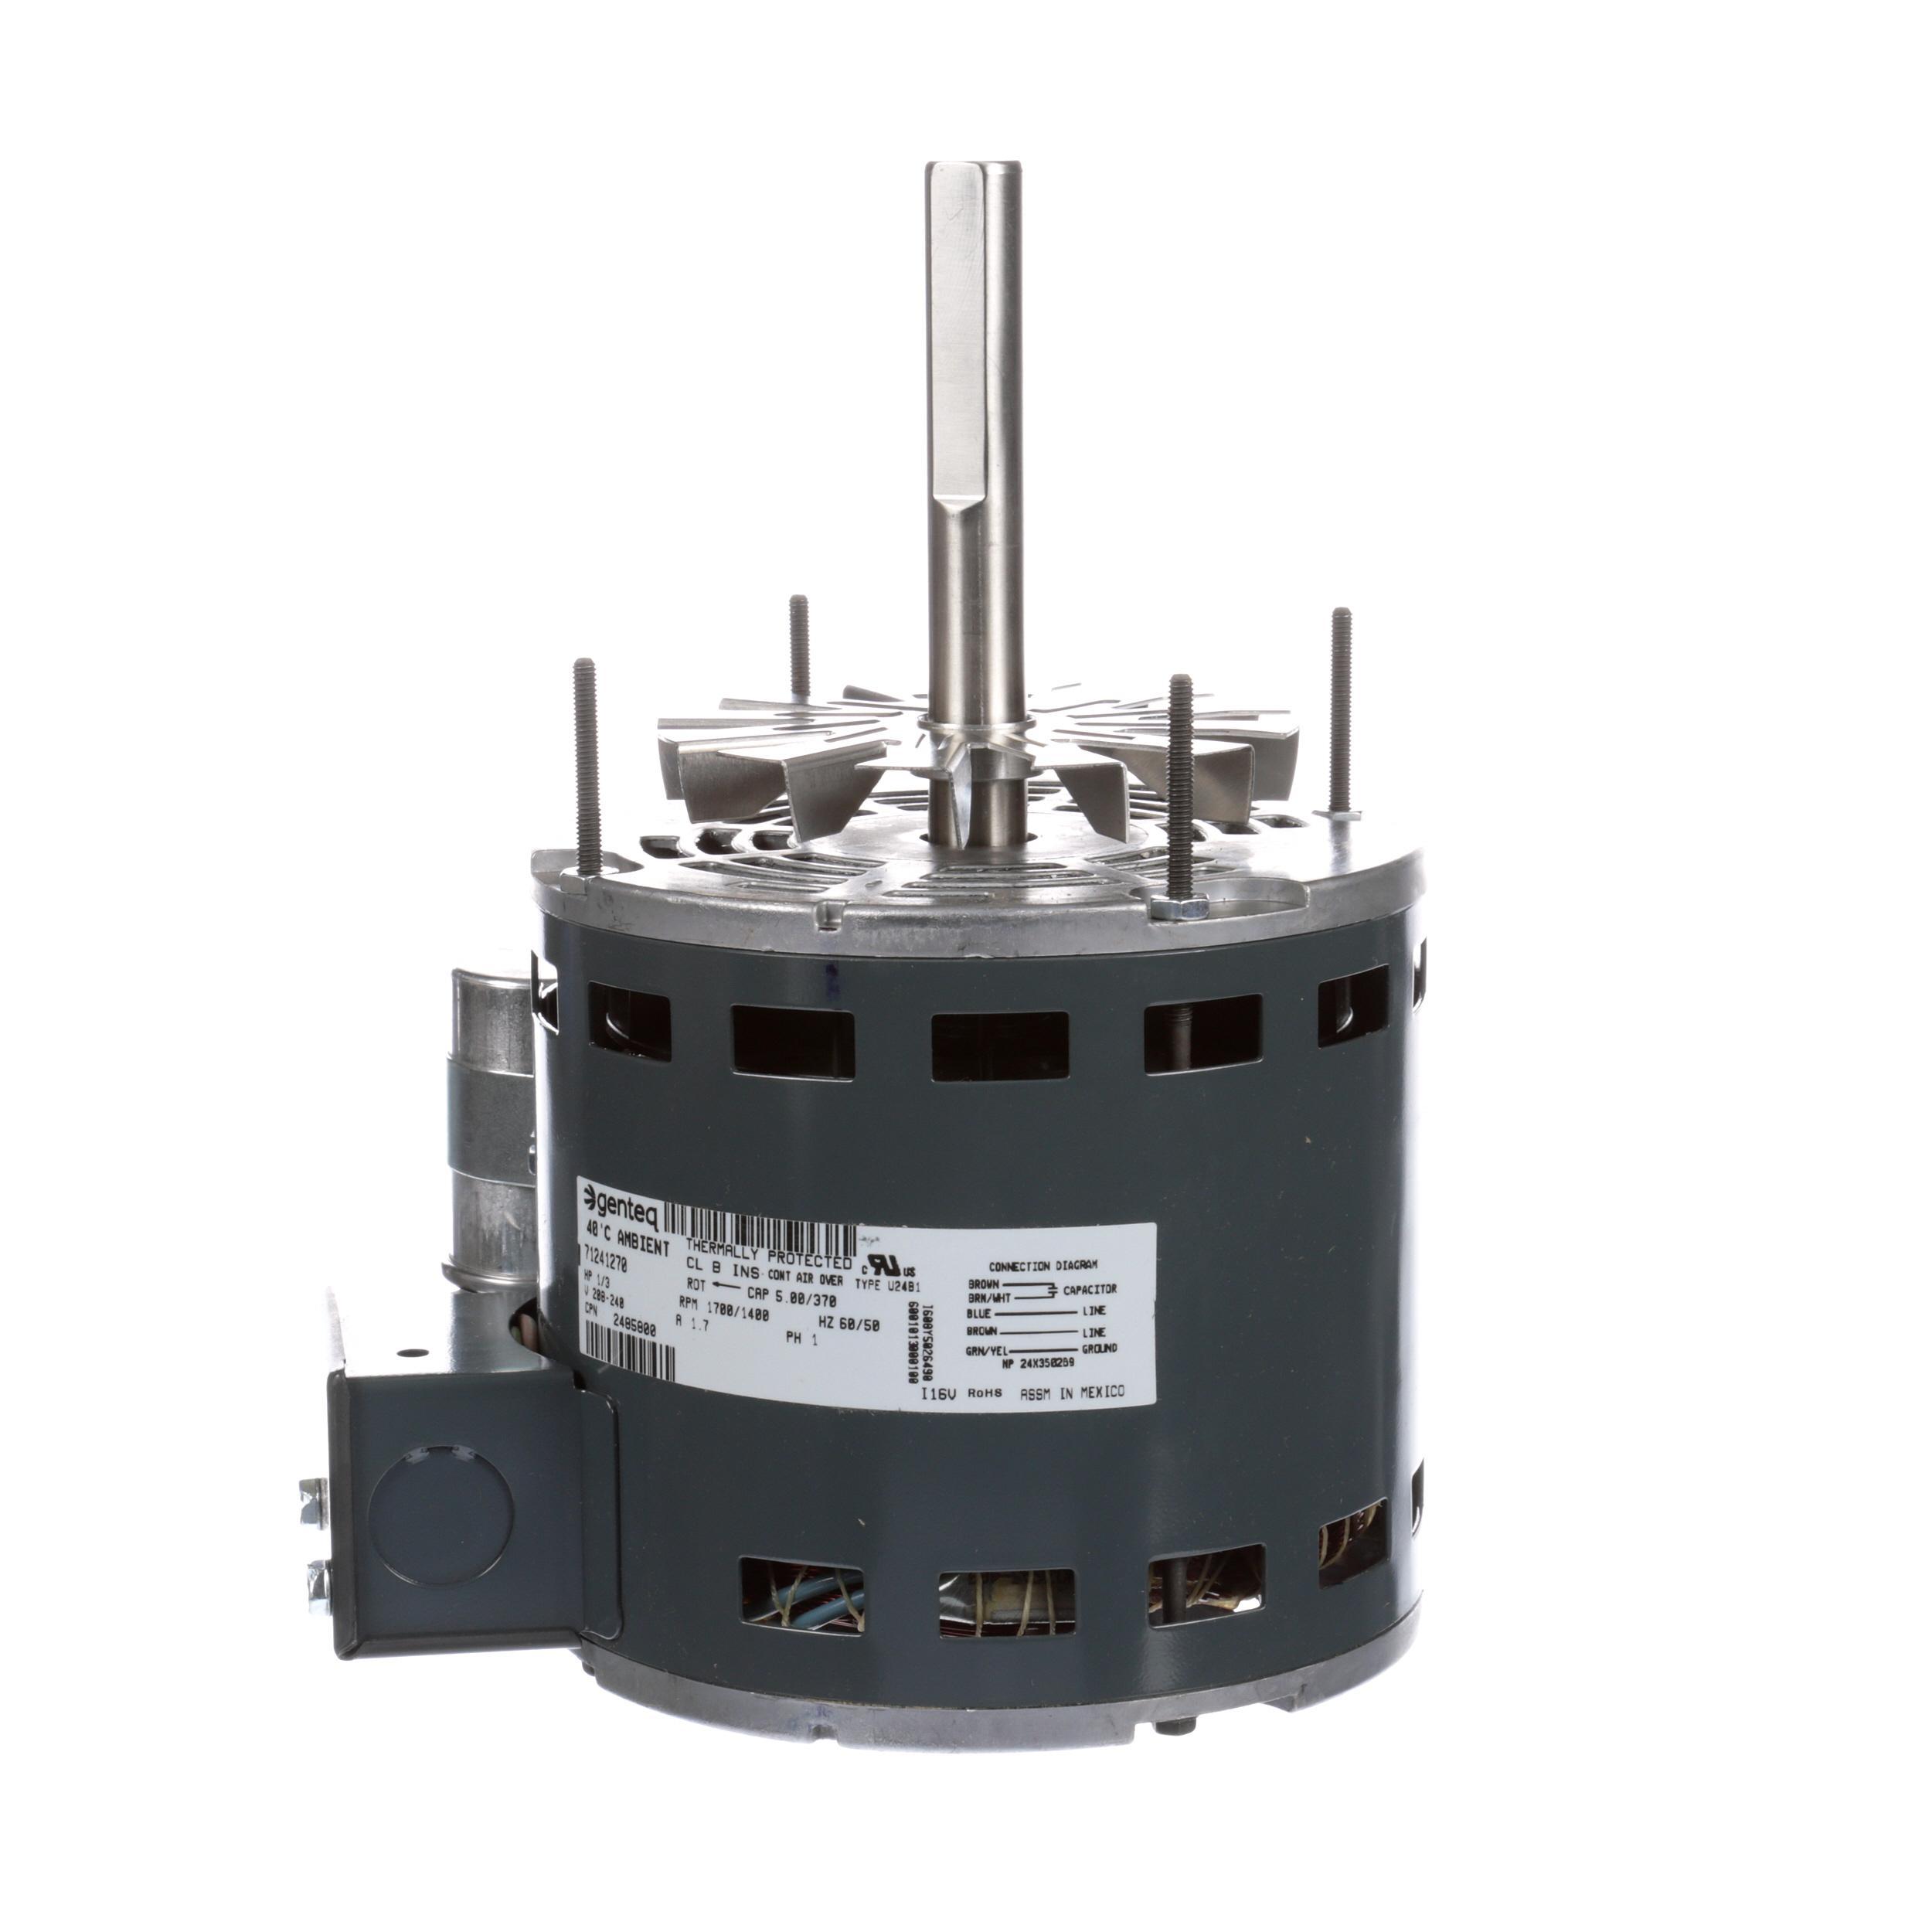 Garland motor psc 1 3 hp 208 240v 50 6 part 2485800 for 1 3 hp psc motor